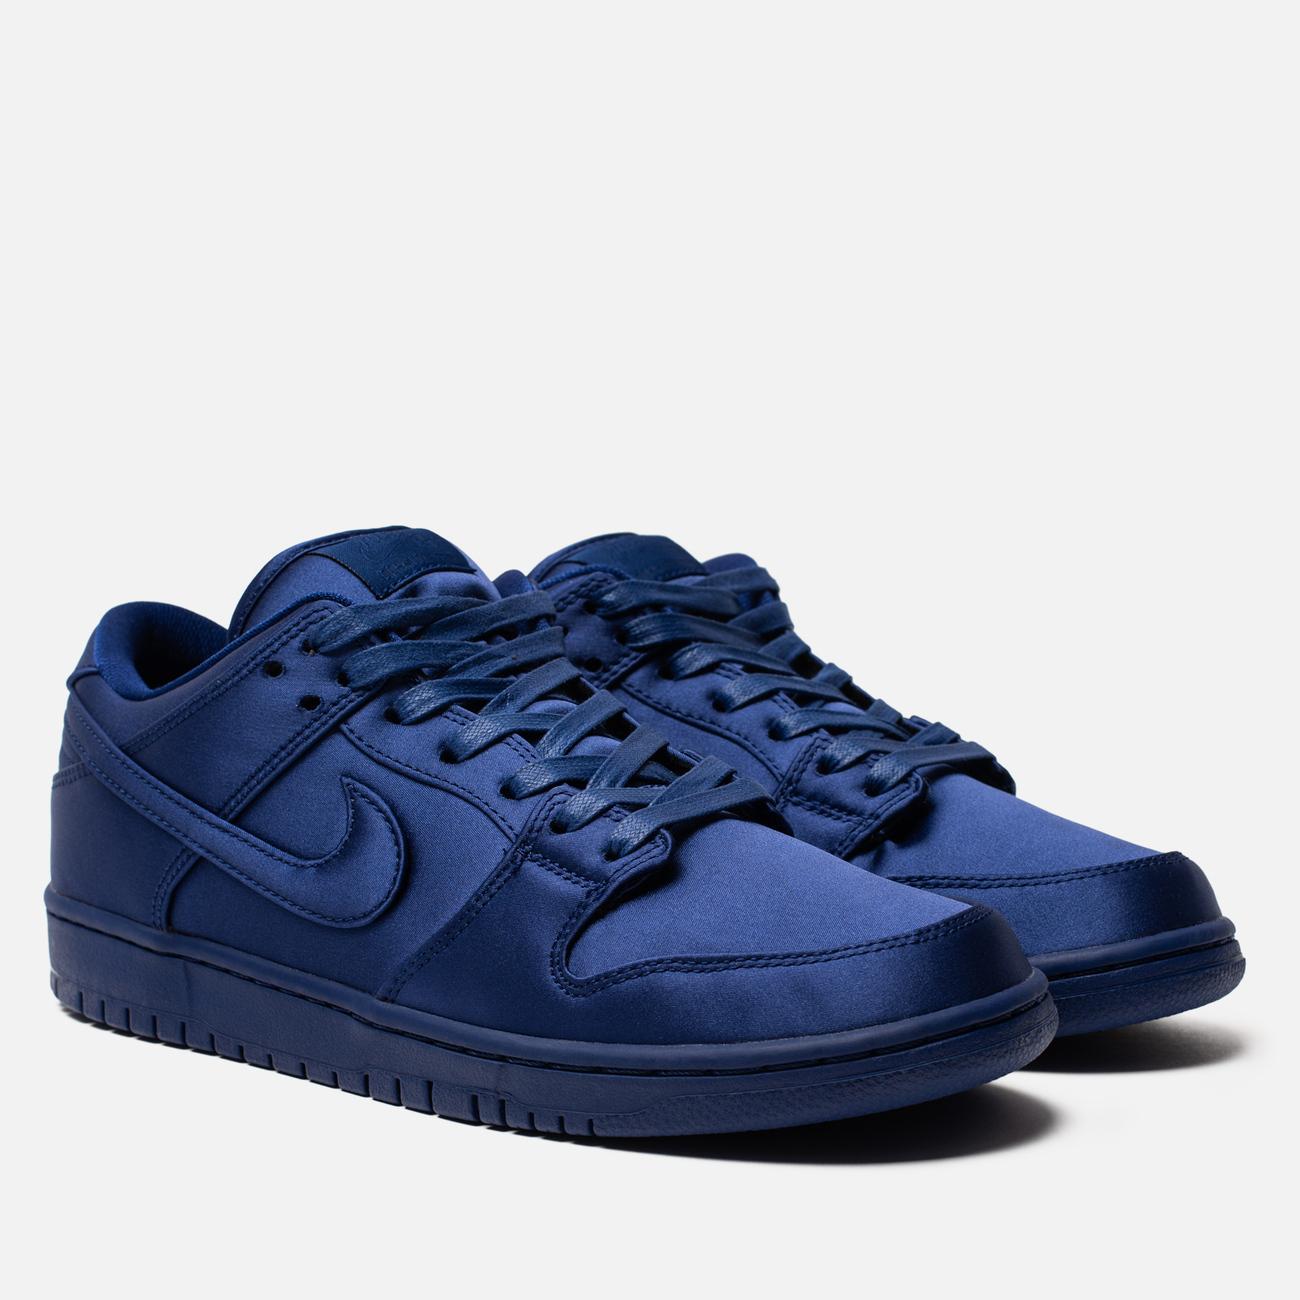 Мужские кроссовки Nike SB Dunk Low TRD NBA Deep Royal Blue/Deep Royal Blue